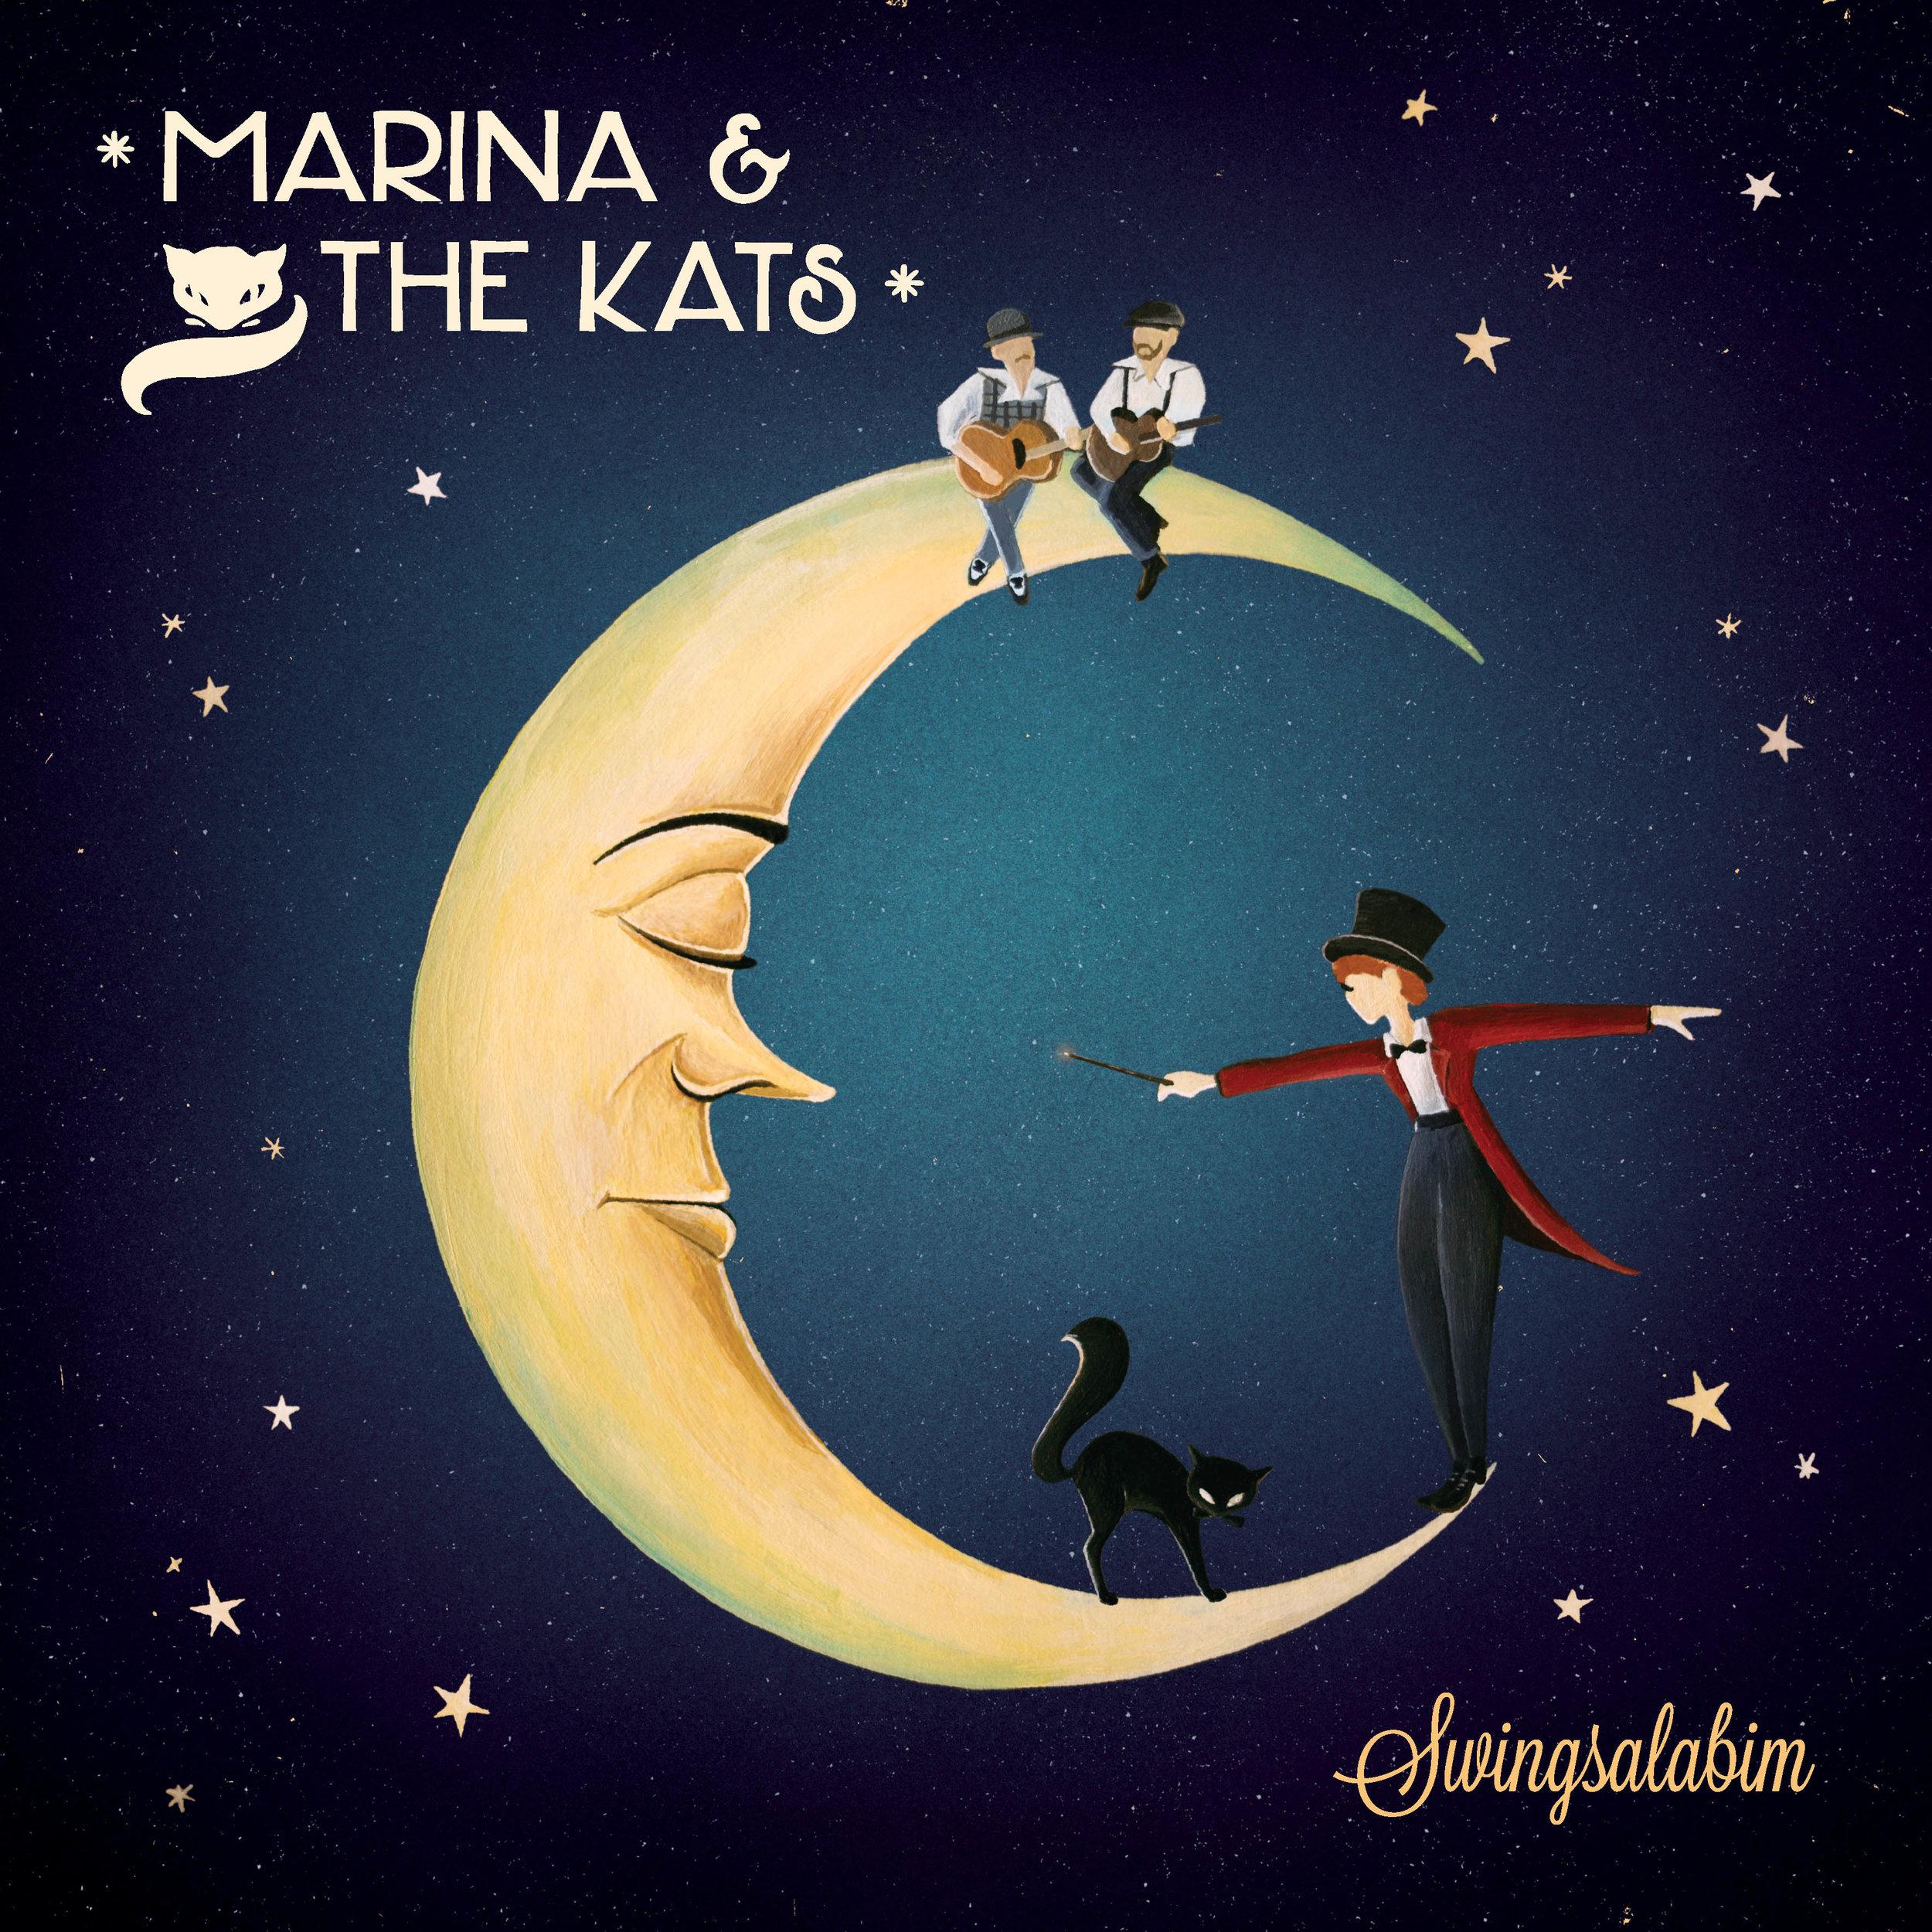 Marina & The Kats - Swingsalabim (2019)